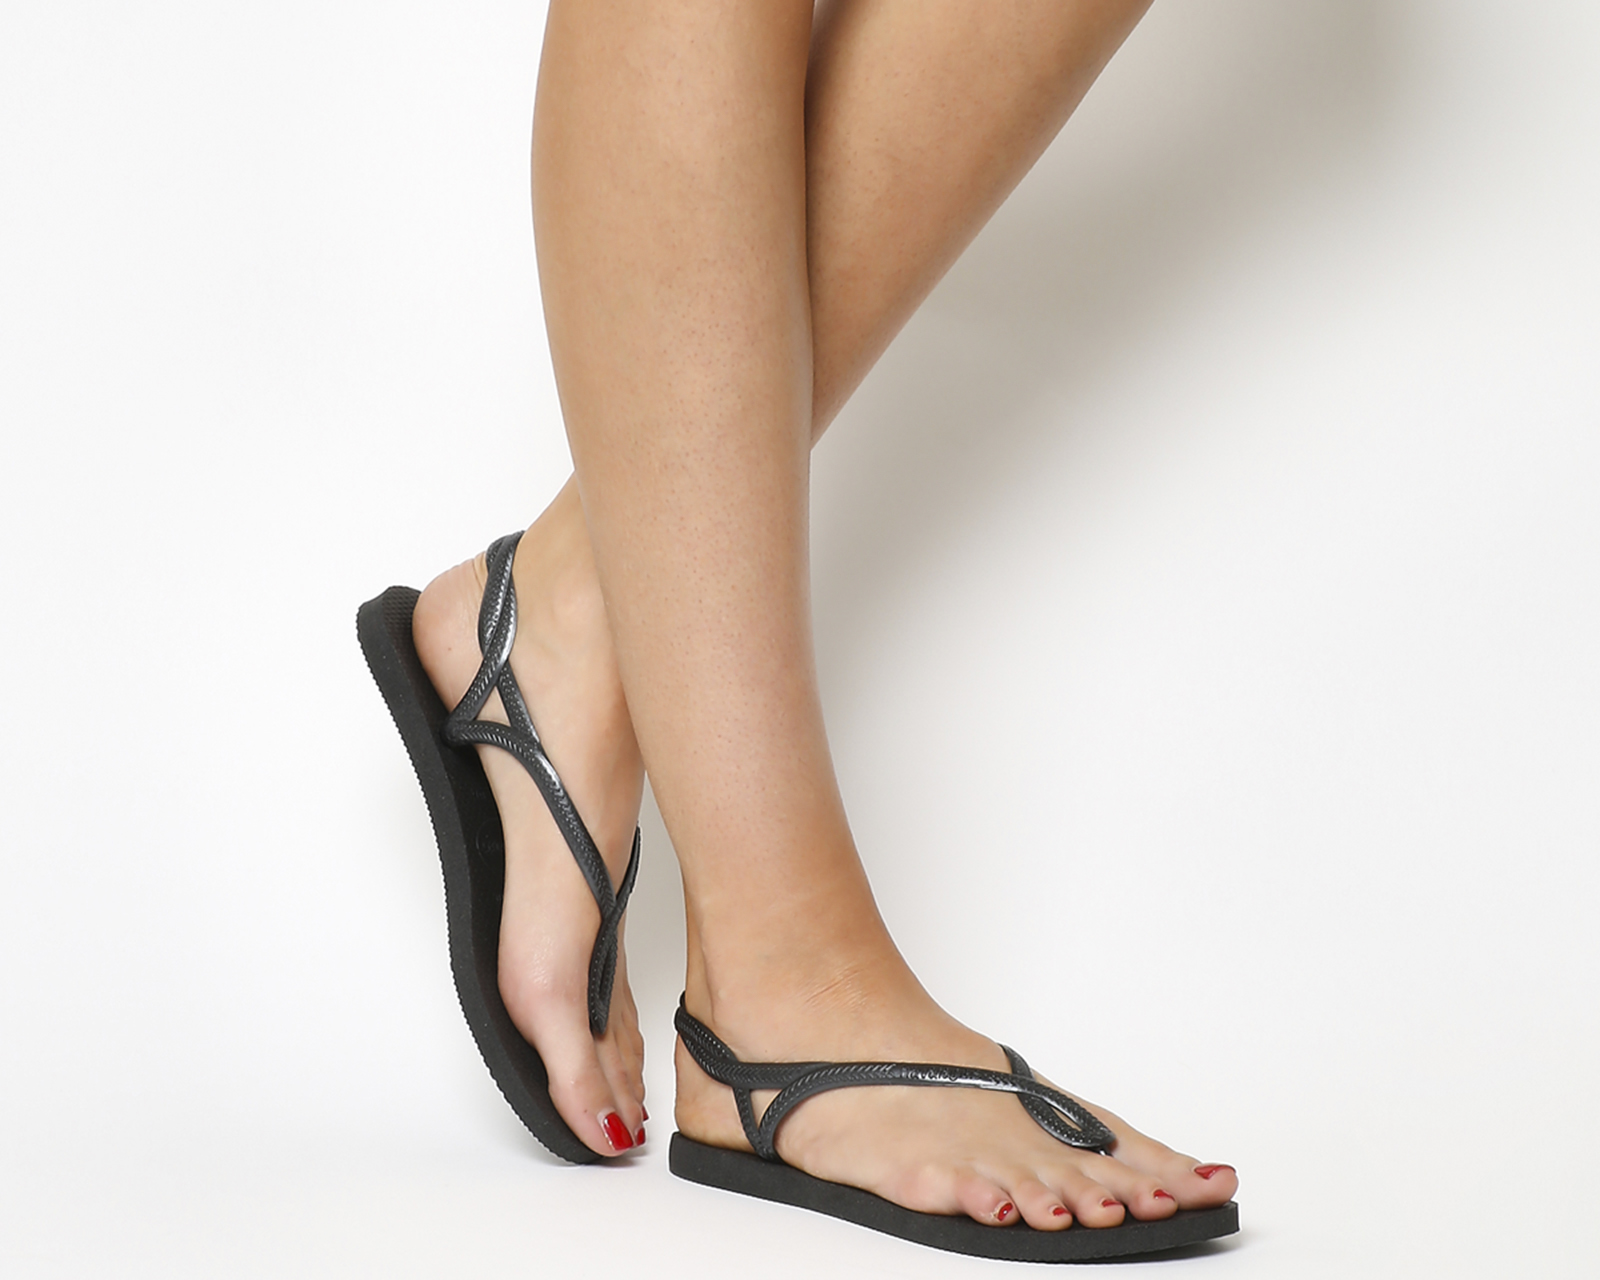 9ebabbd483d1f3 Sentinel Womens Havaianas Luna Flip Flops Black Sandals